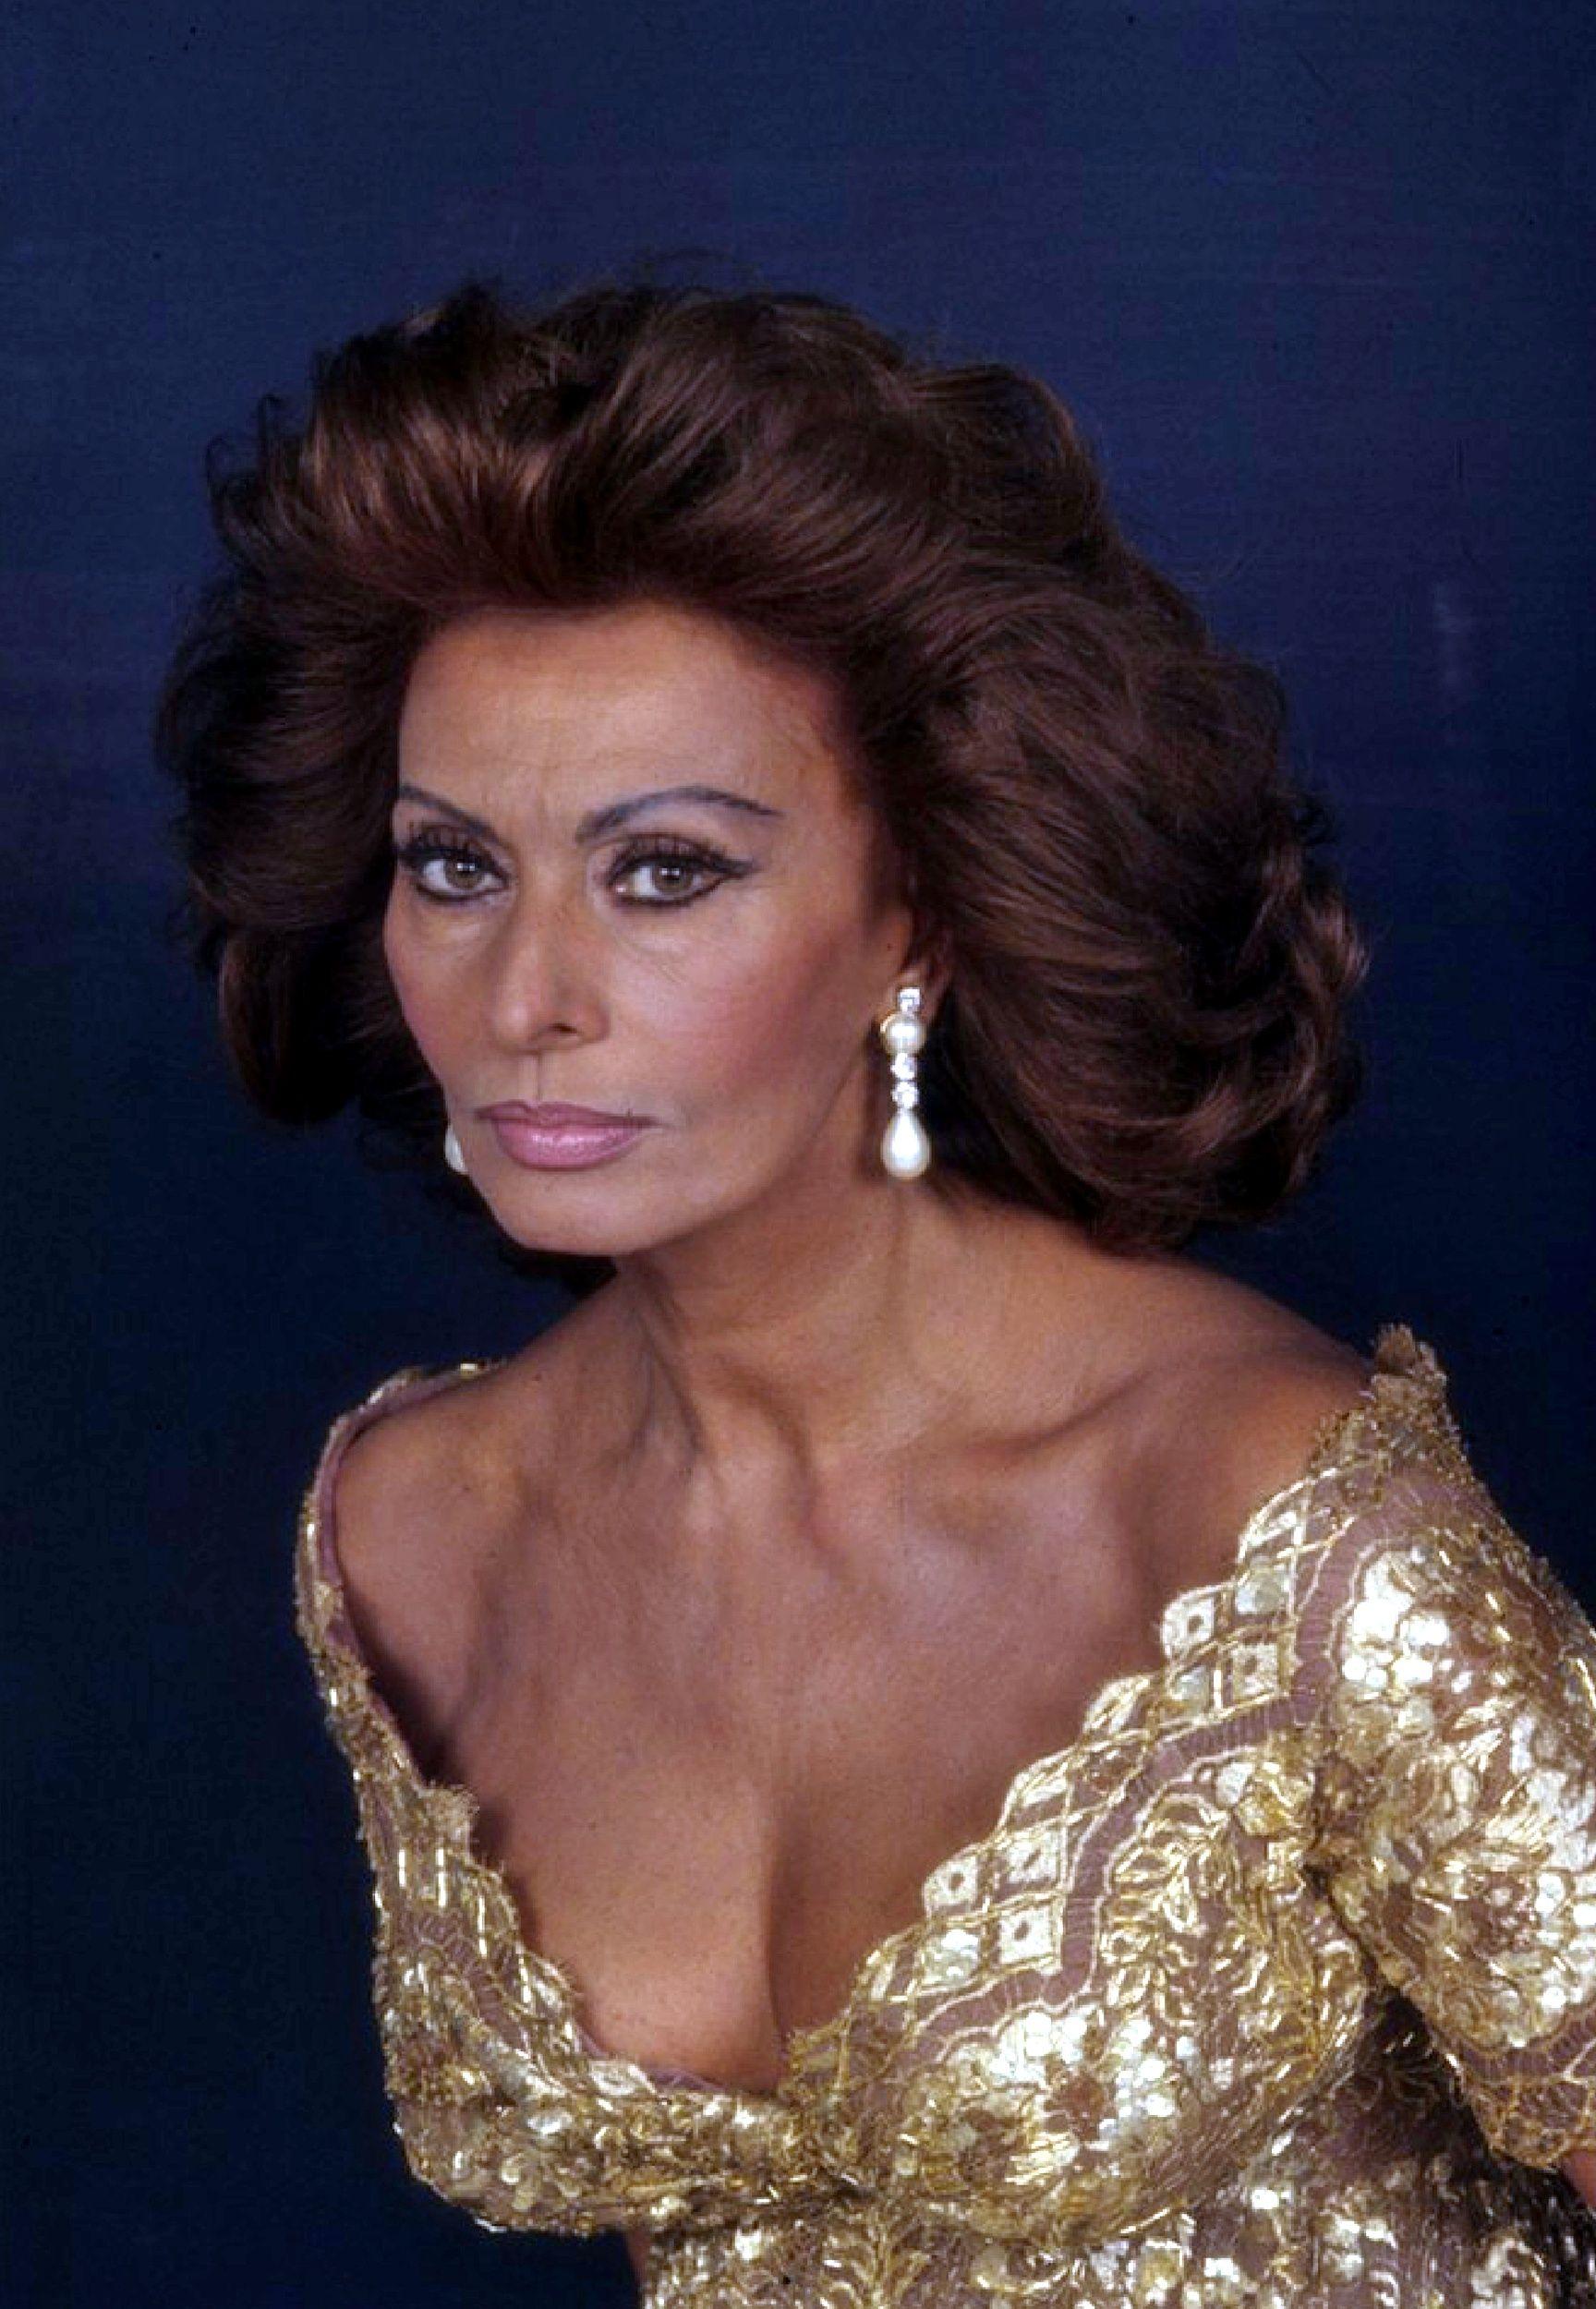 Pin by Olivia Fontana on Sophia in 2019 | Sophia Loren ...